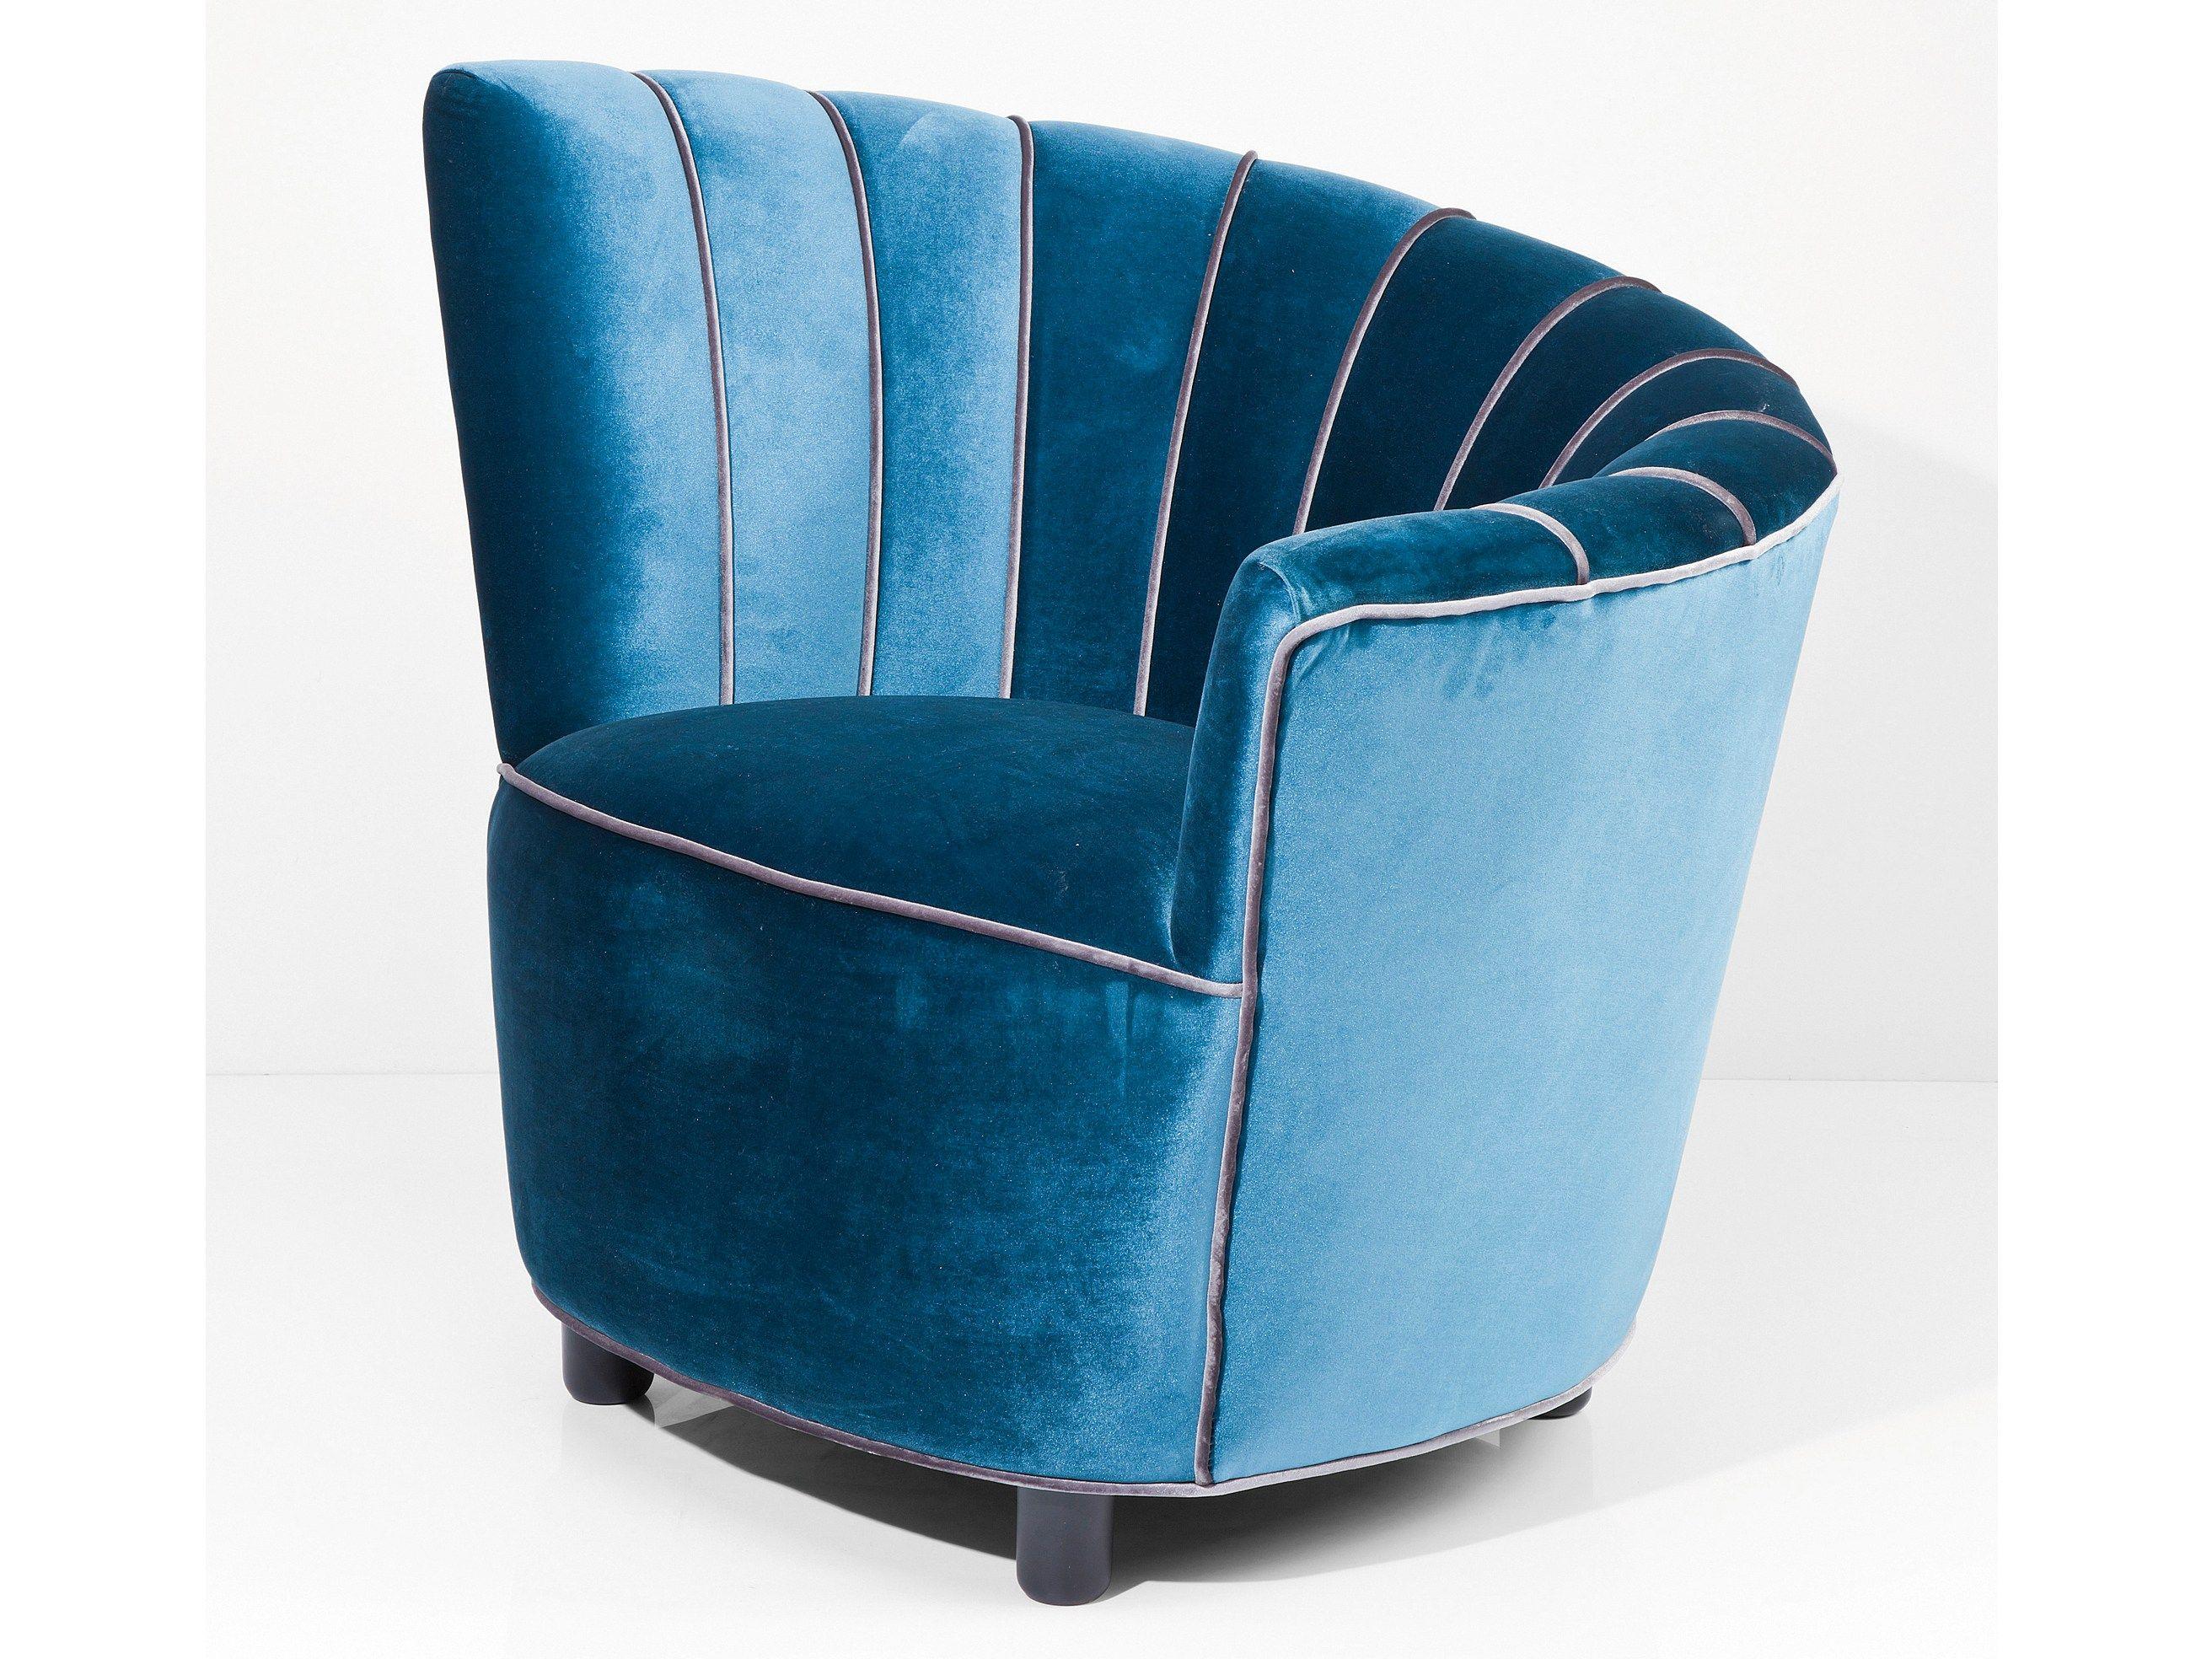 Kare design barock sessel sessel von kare design g nstig for Design stuhl barocco